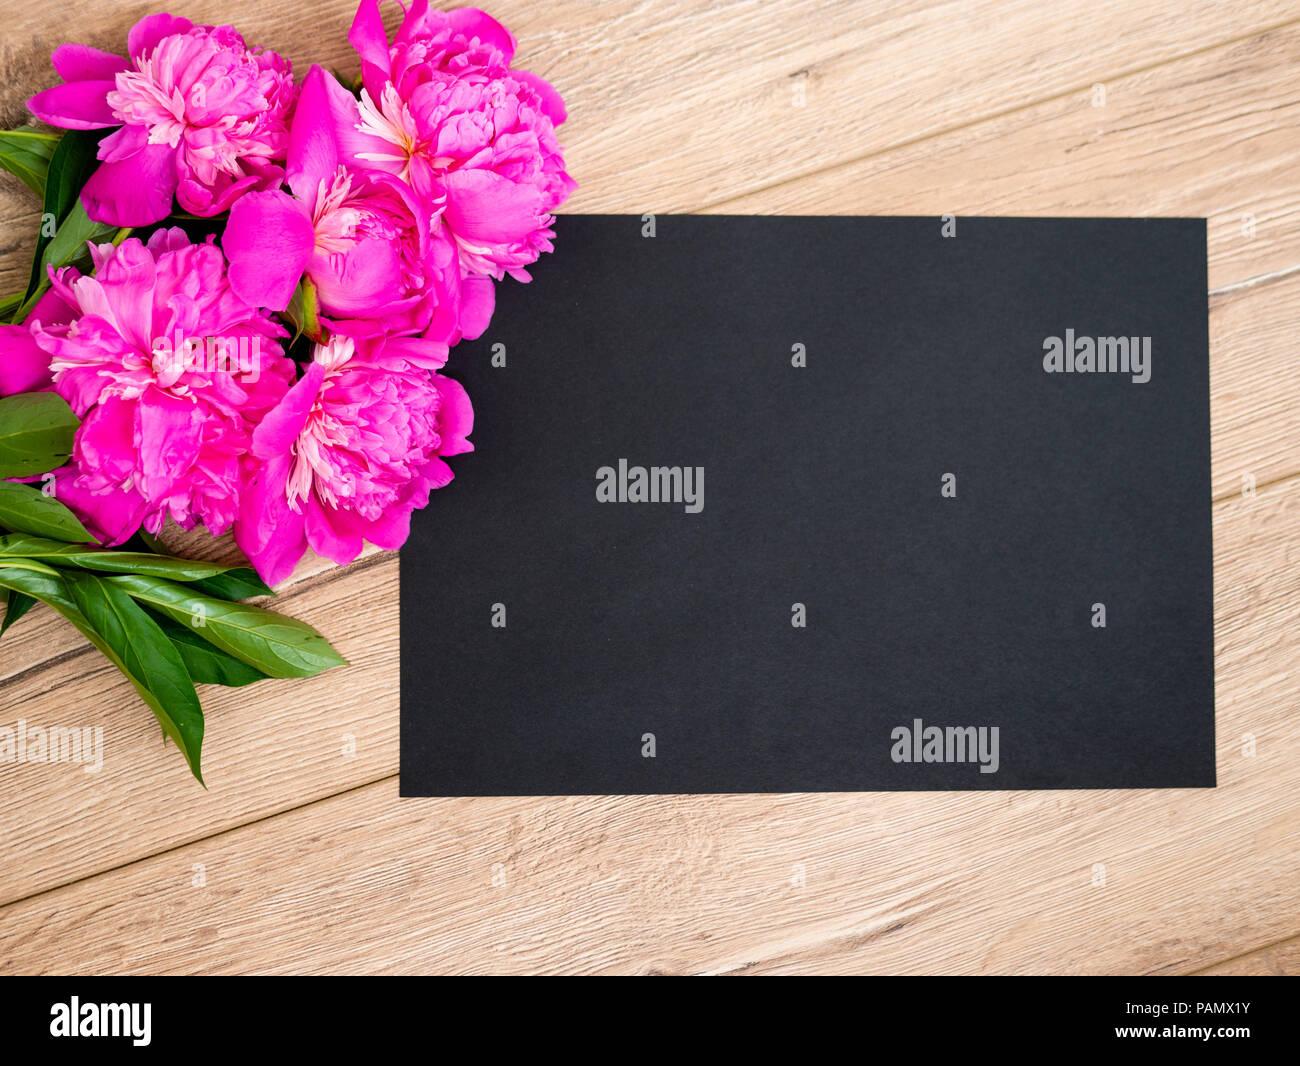 Magenta Paper Flower Black Background Stock Photos Magenta Paper